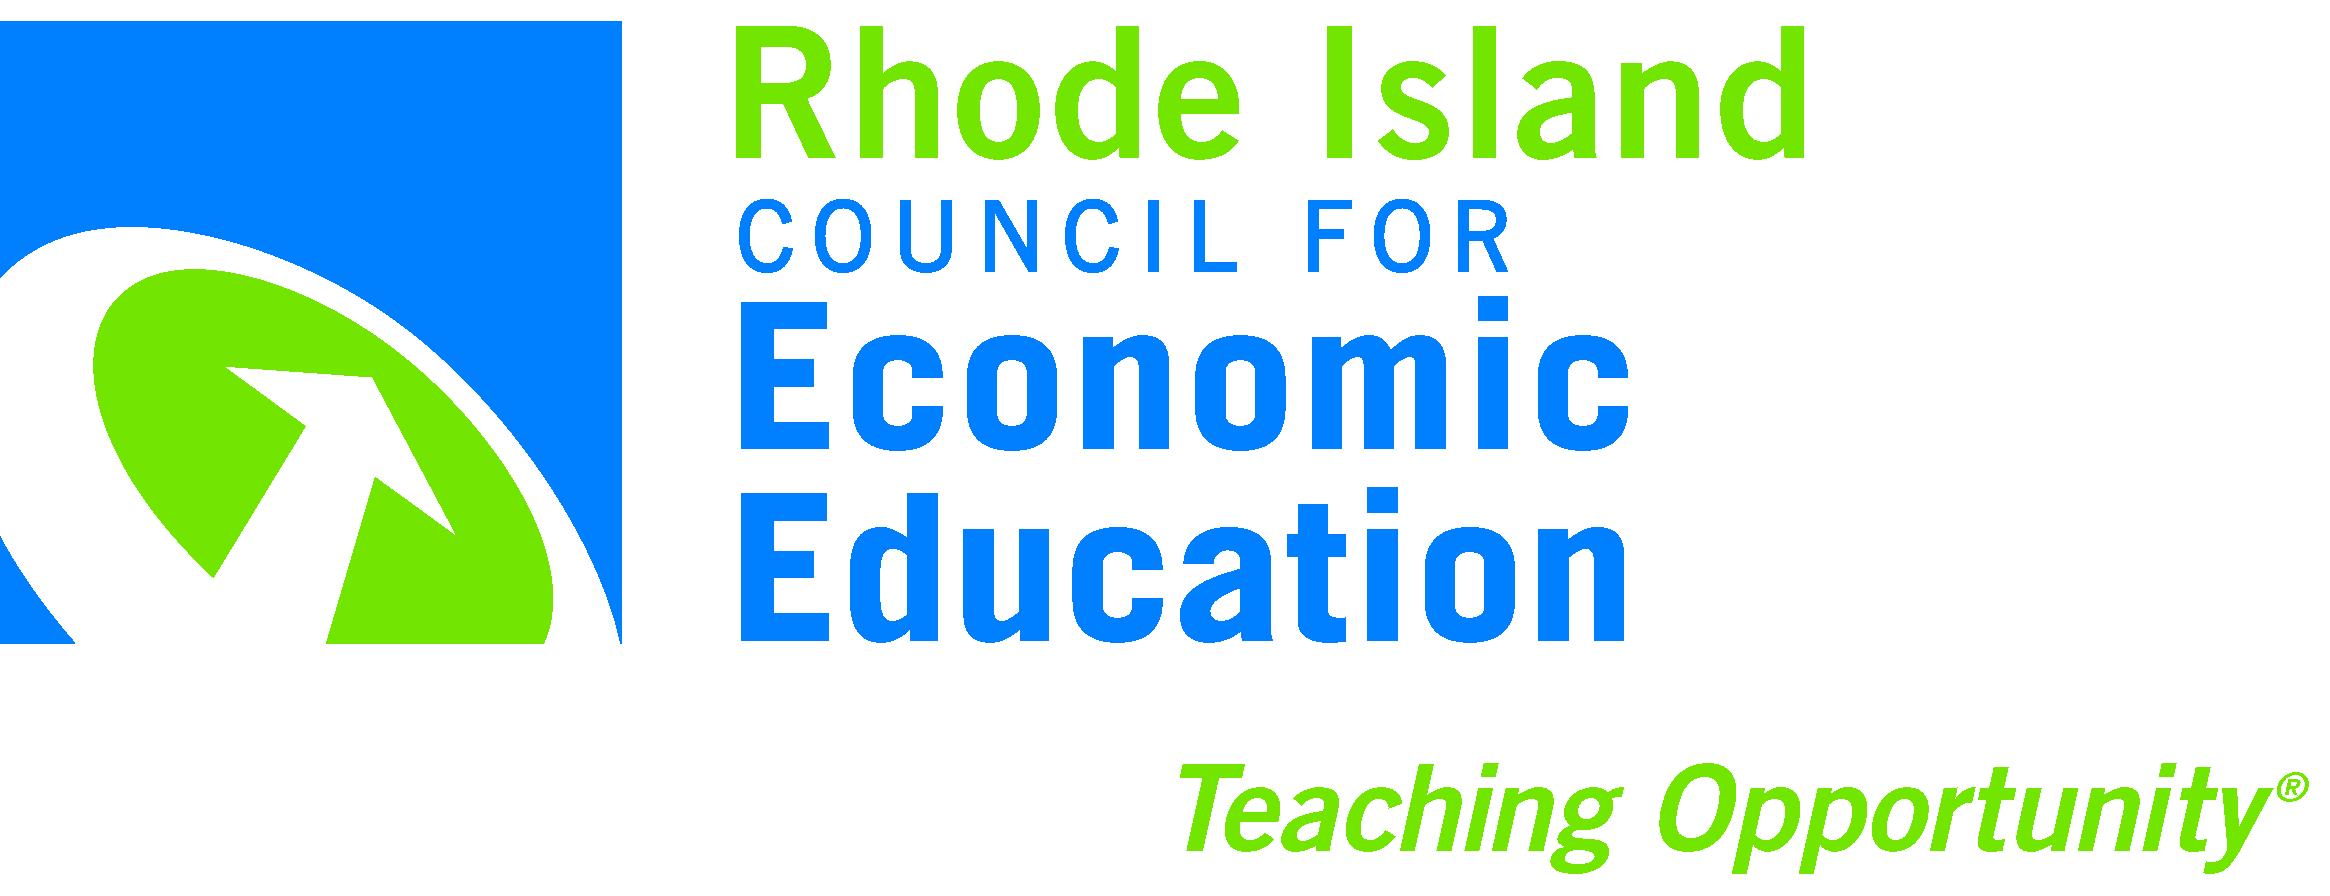 https://financechallenge.unl.edu/images/custom/ri-council-logo-high-res(8)_2.jpg